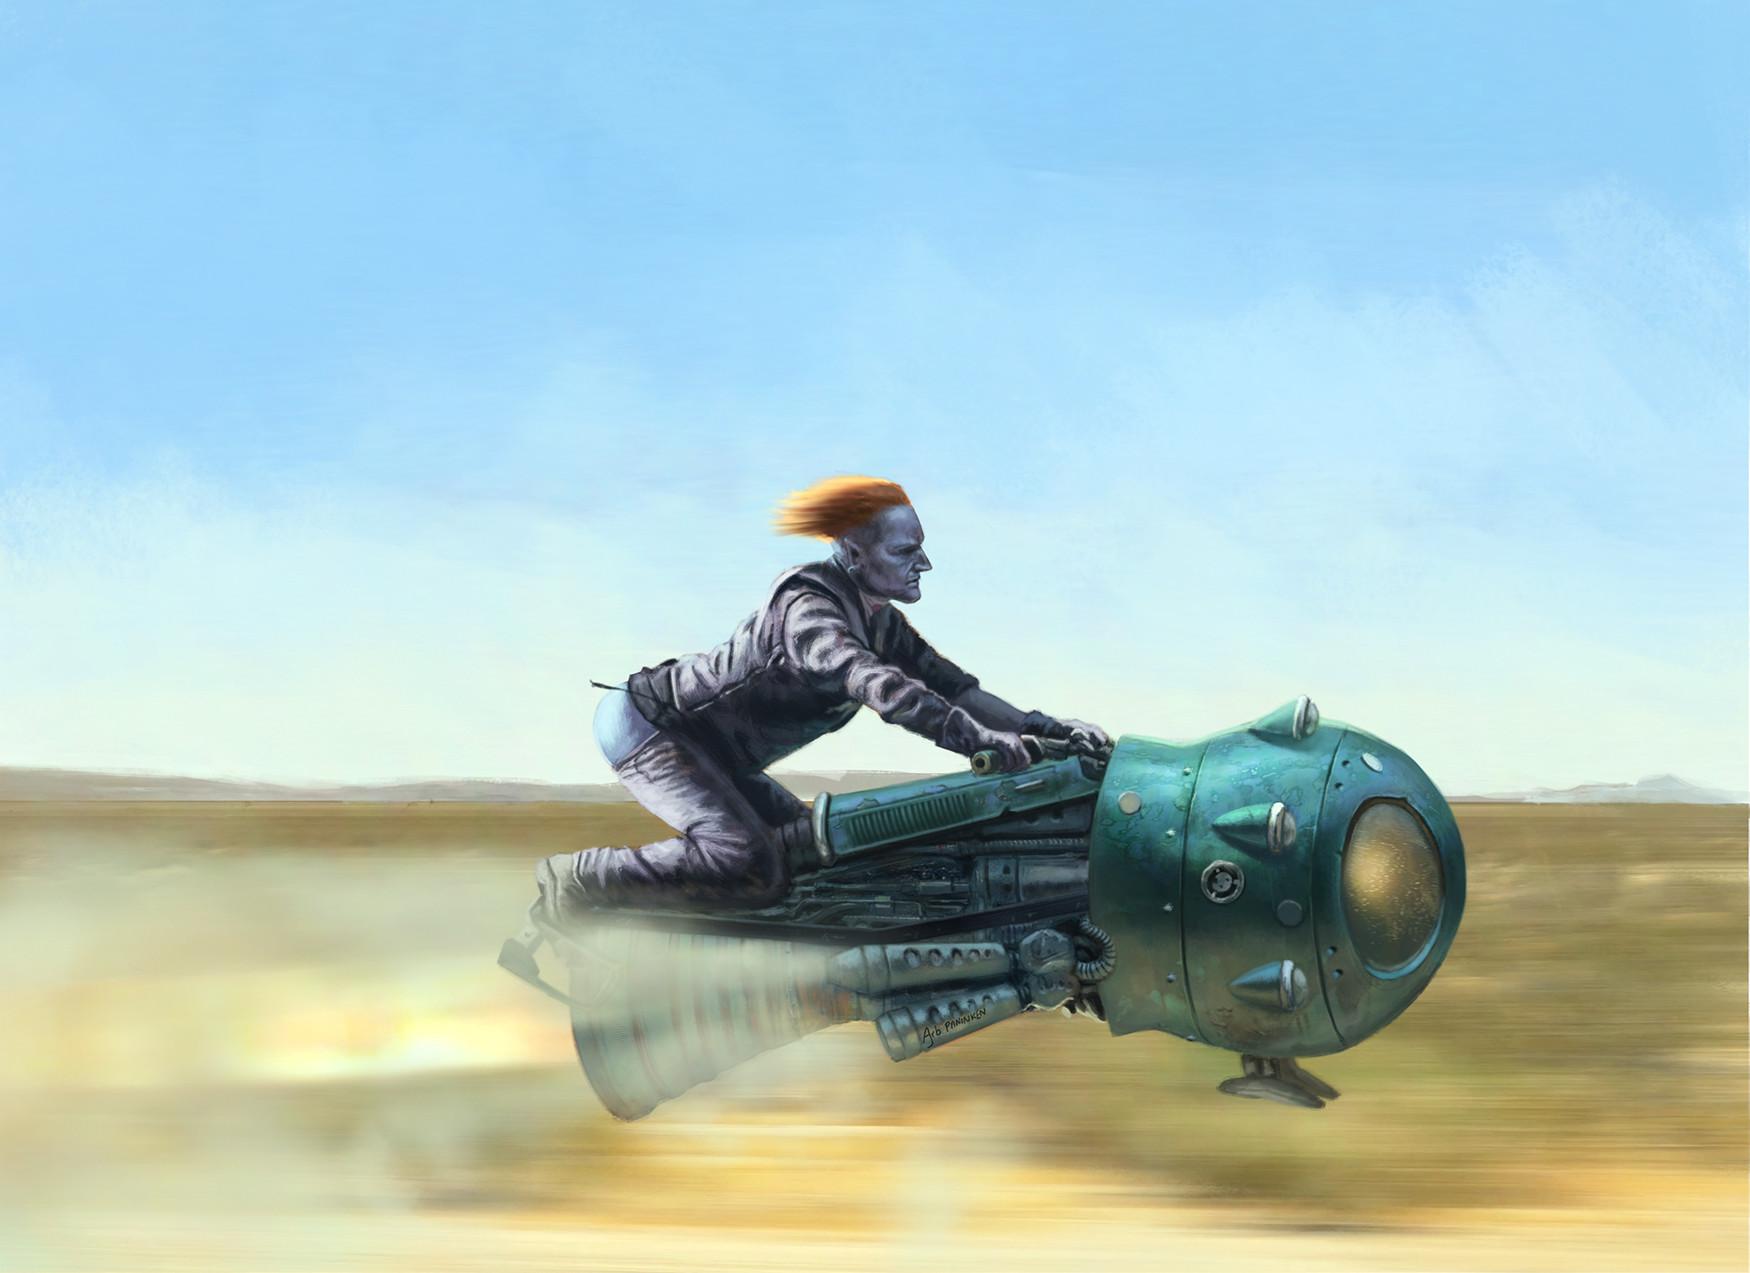 arb-paninken-steampunk1.jpg?1509563652